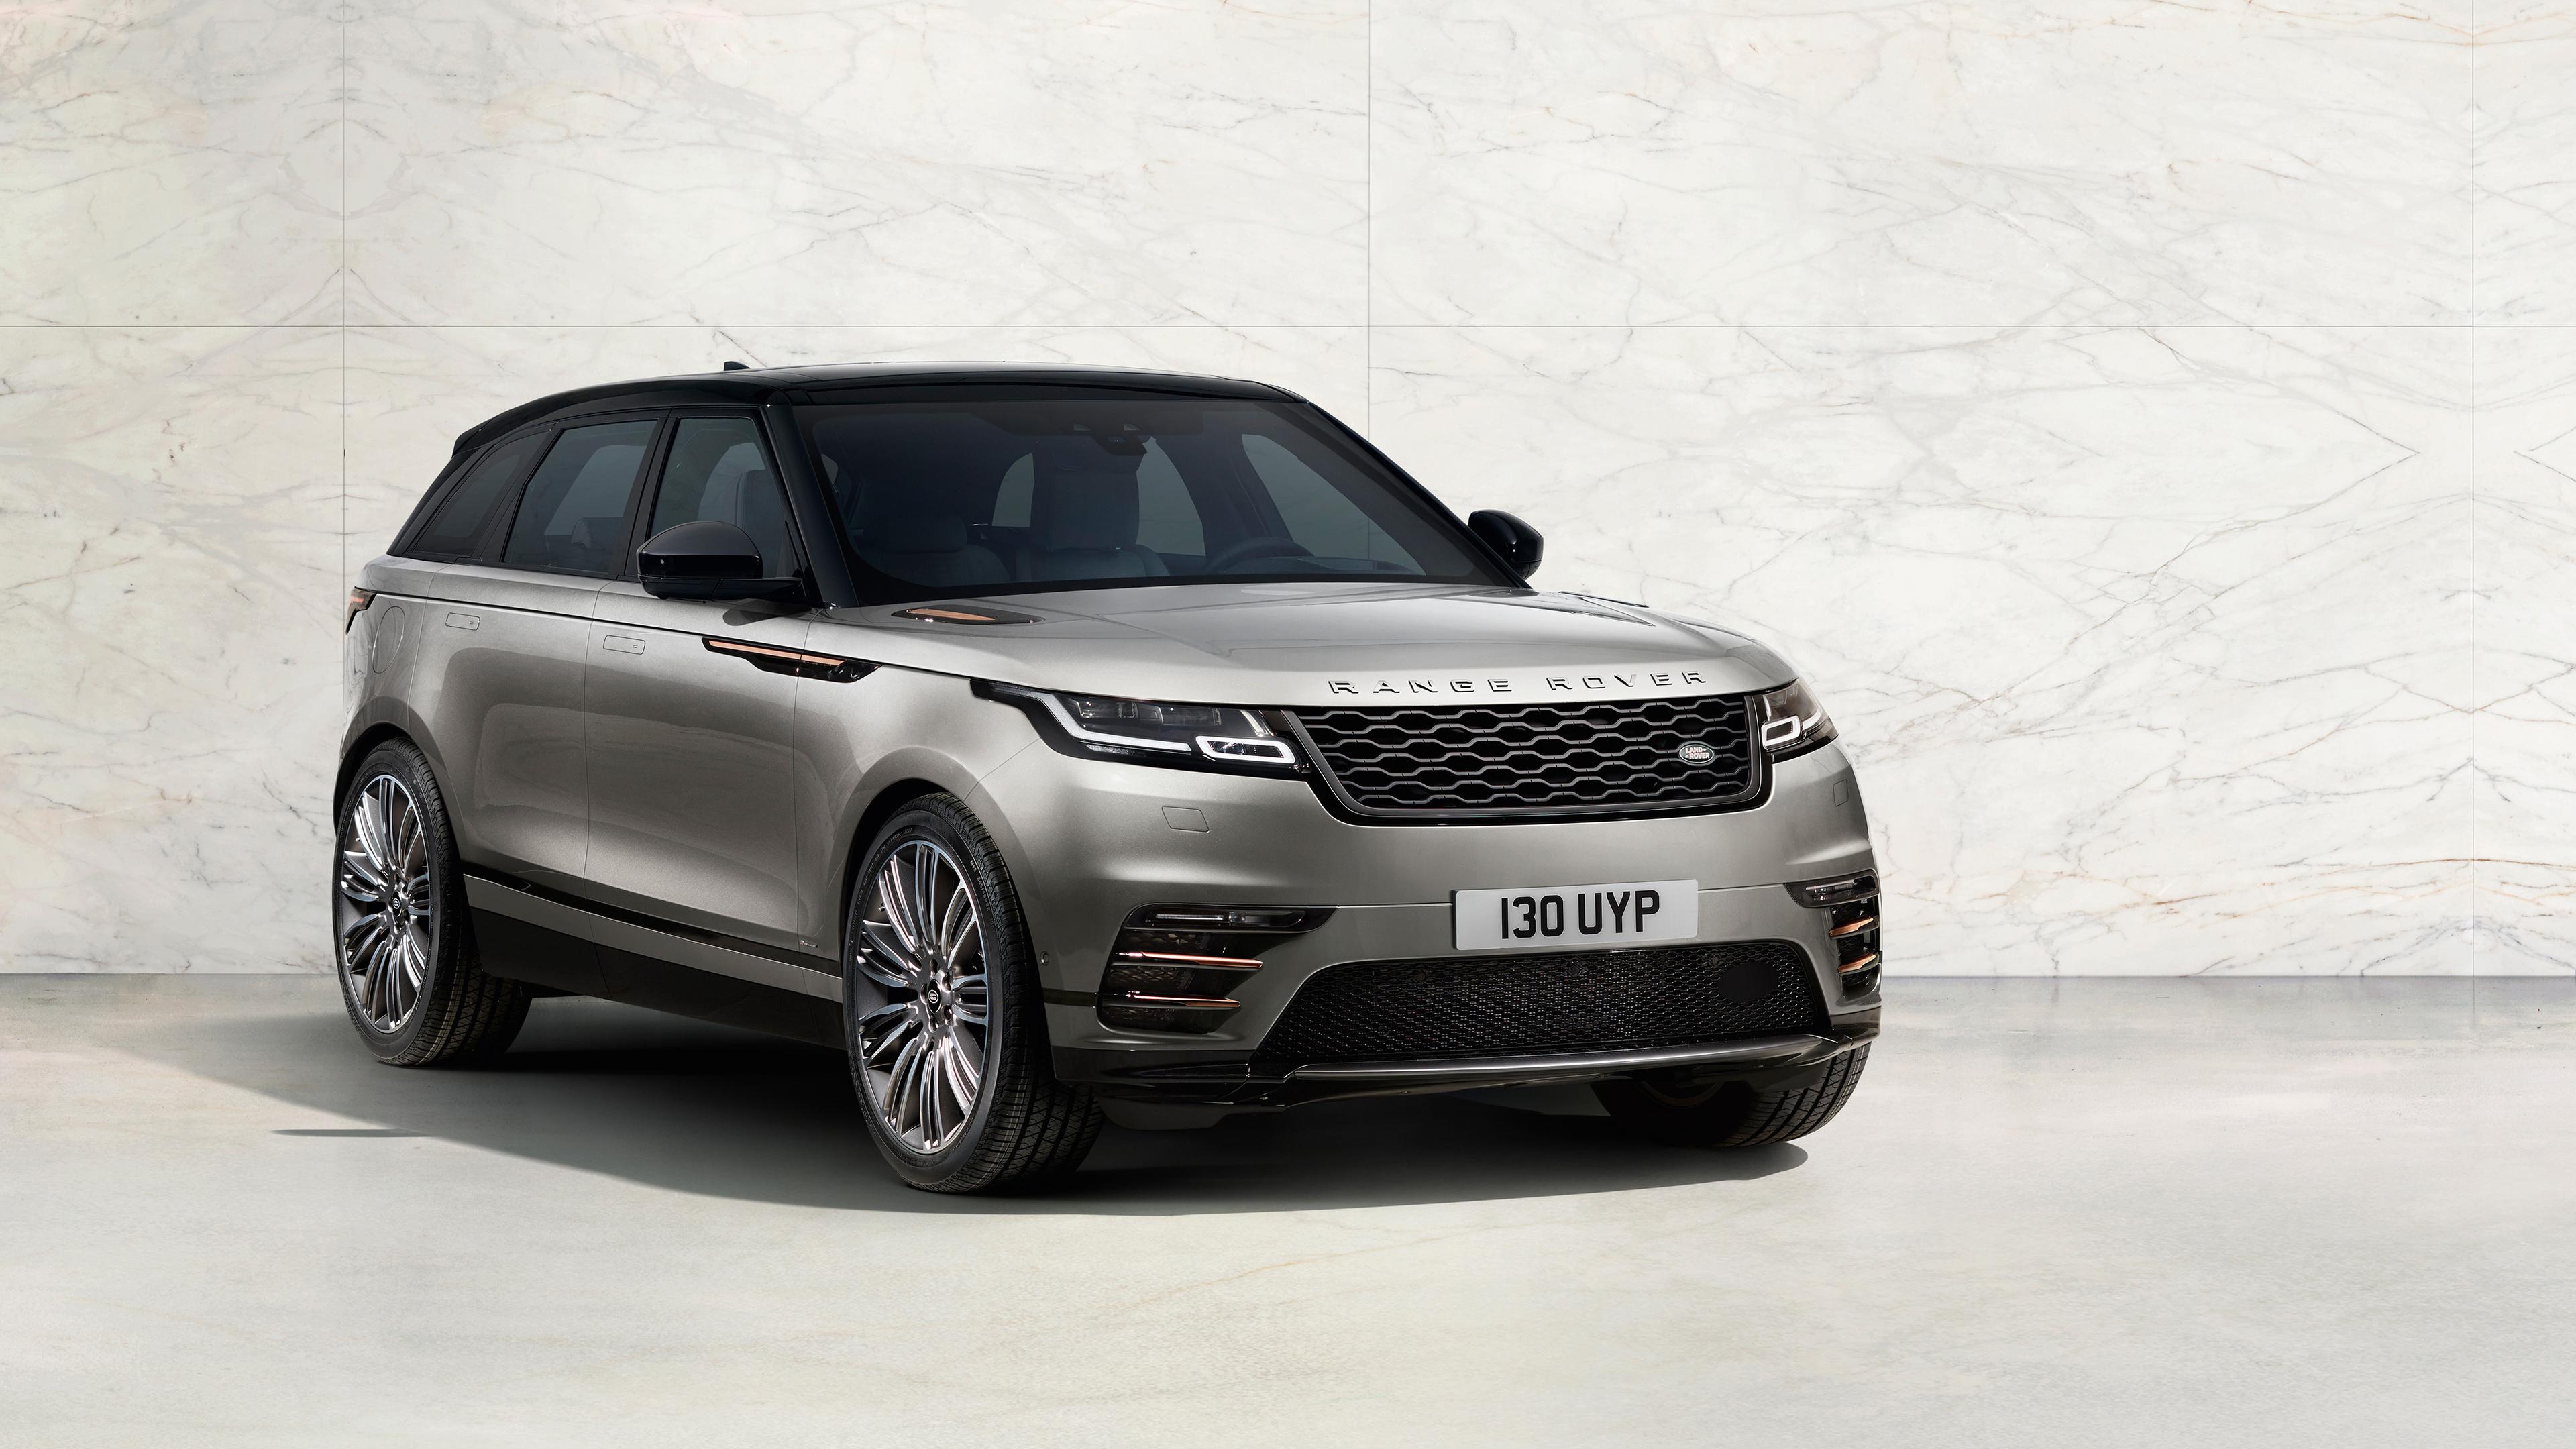 land rover range rover velar 4k 1539104989 - Land Rover Range Rover Velar 4k - range rover wallpapers, range rover velar wallpapers, land rover wallpapers, hd-wallpapers, cars wallpapers, 4k-wallpapers, 2018 cars wallpapers